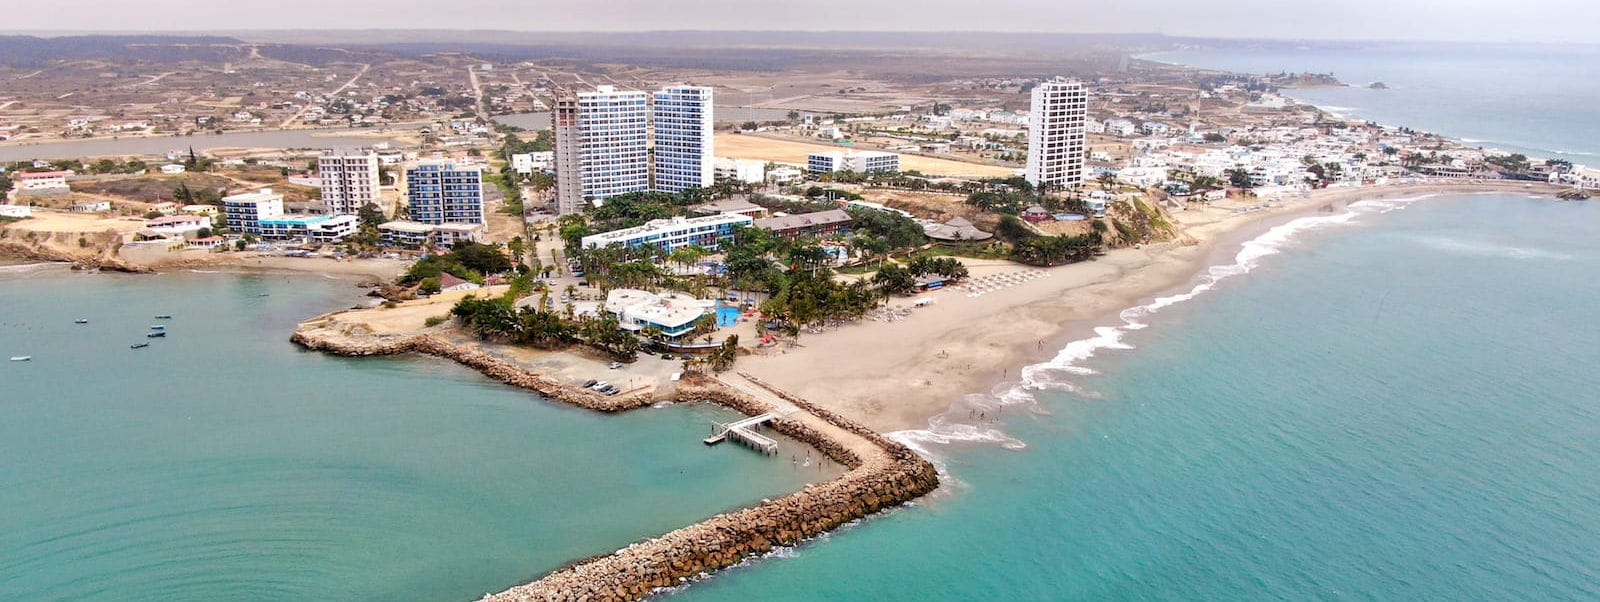 Playa Hogar